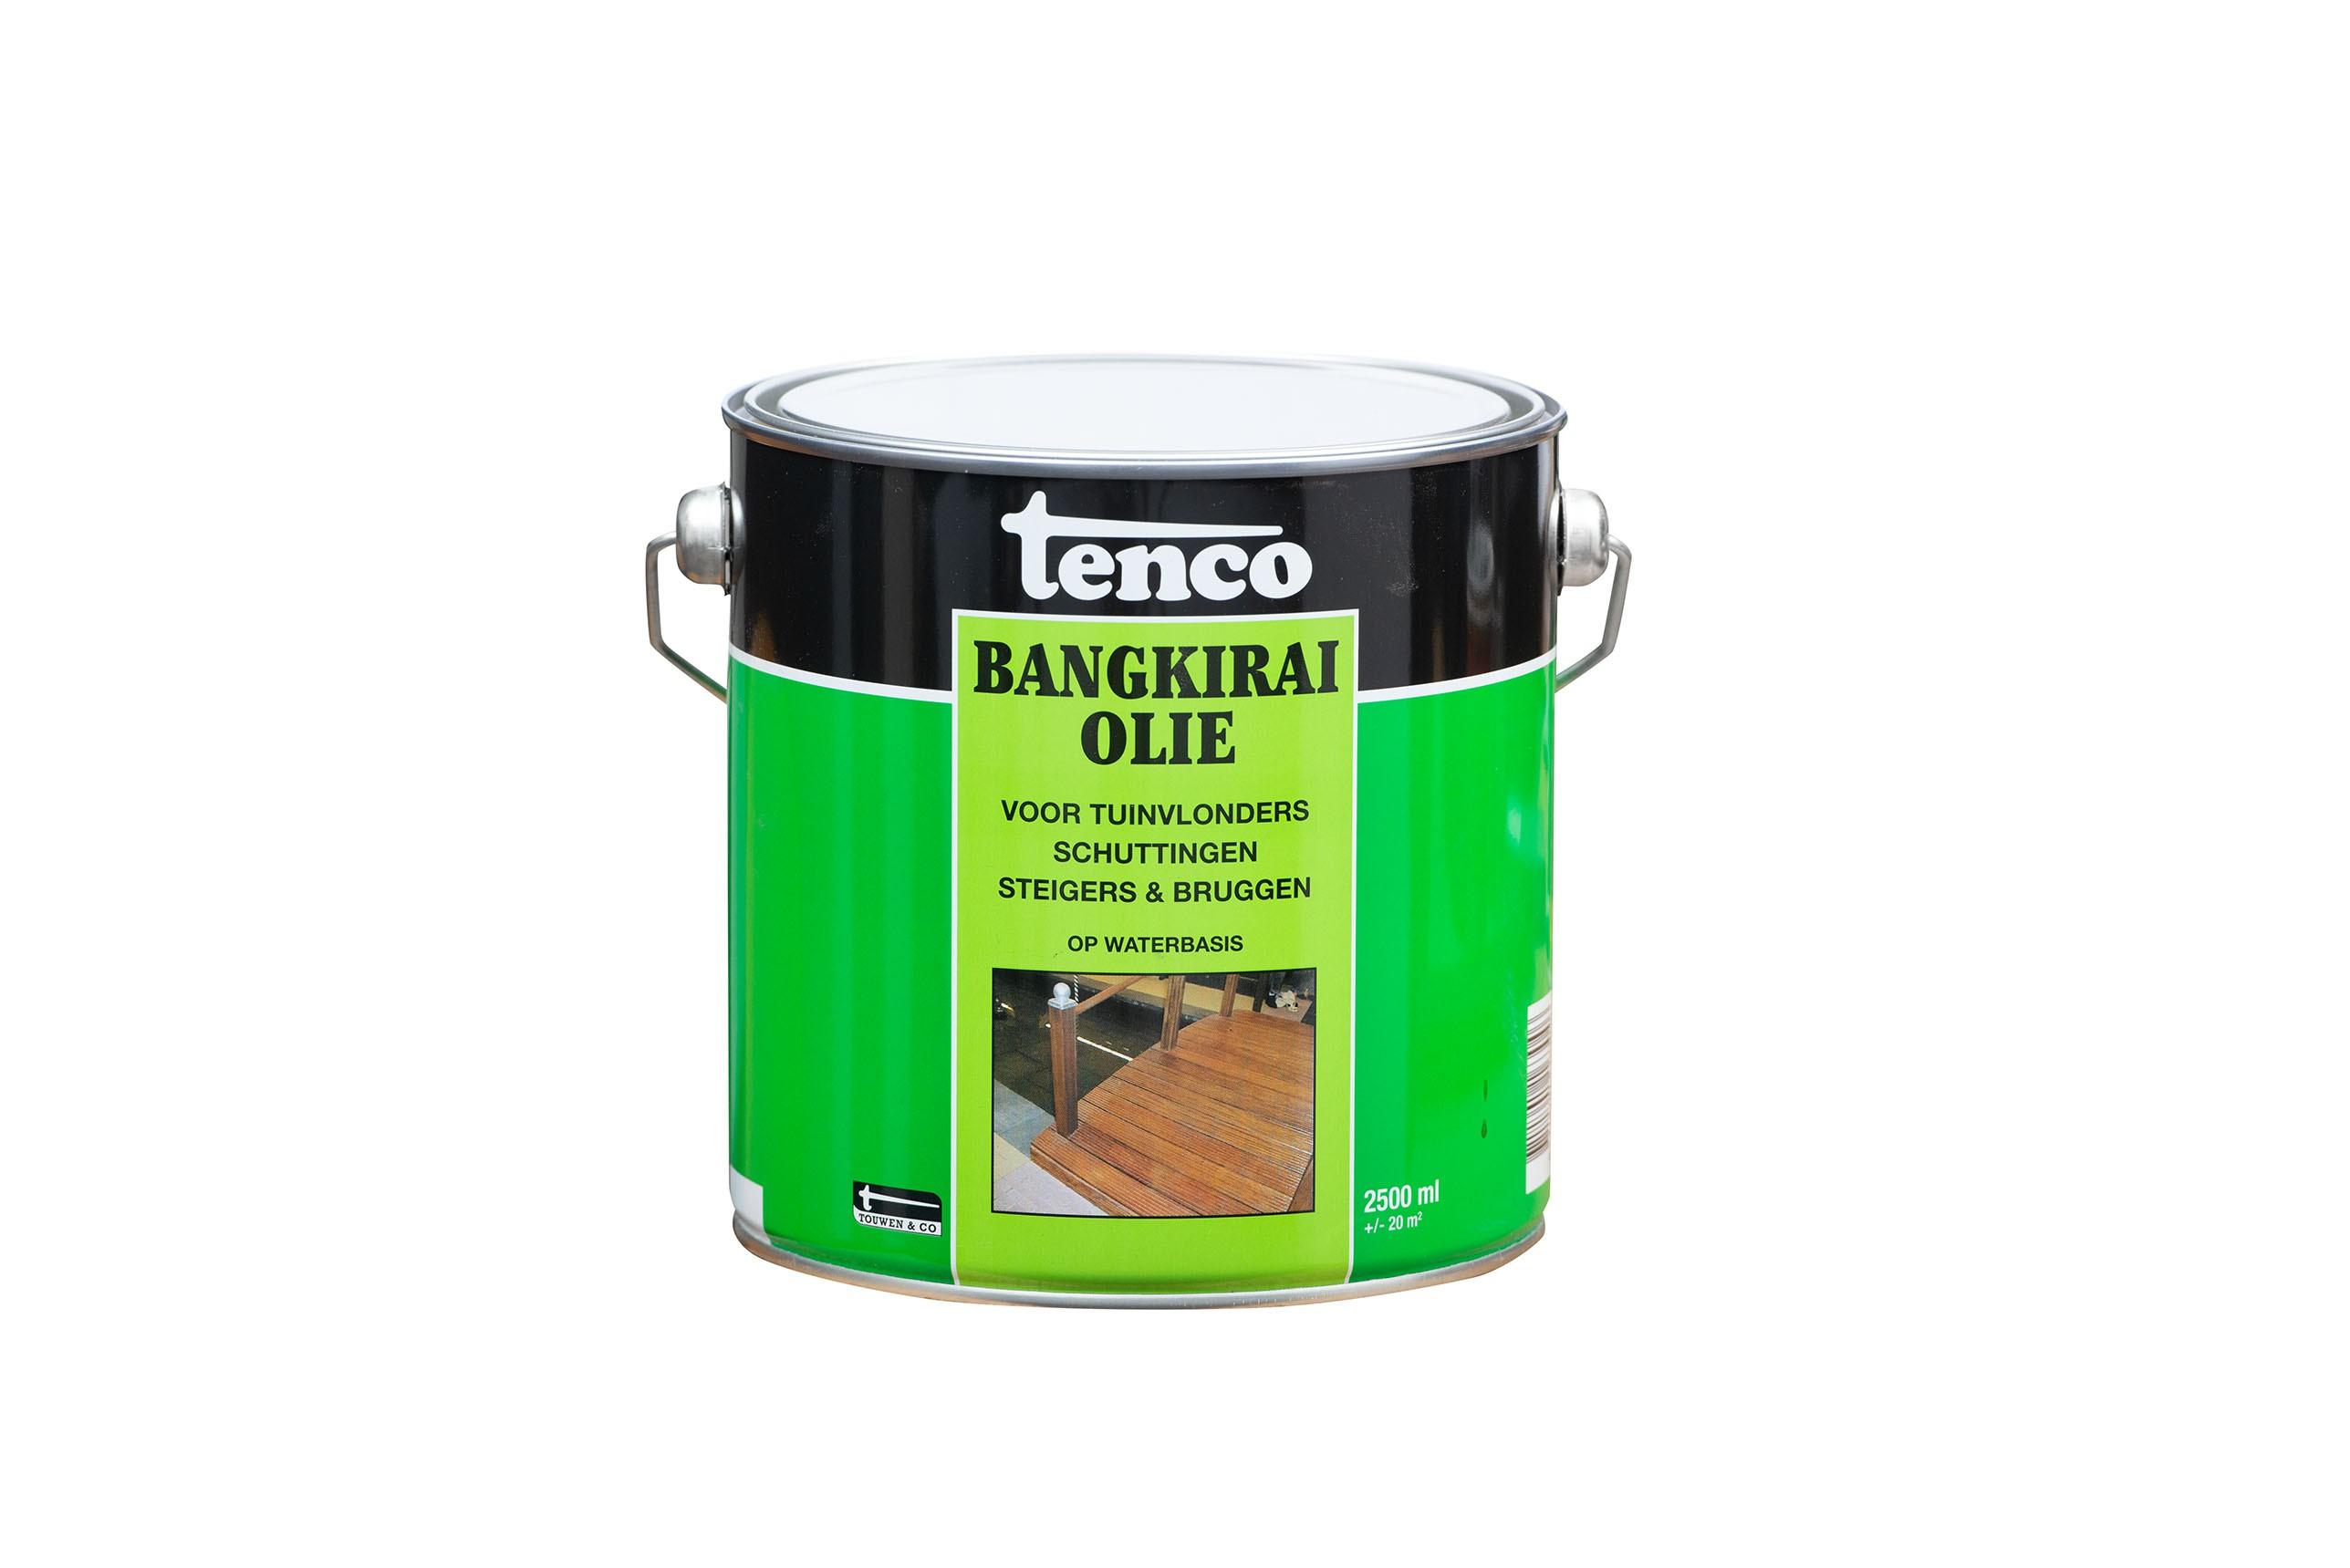 Tenco Bankirai olie  transparant 2,5 liter